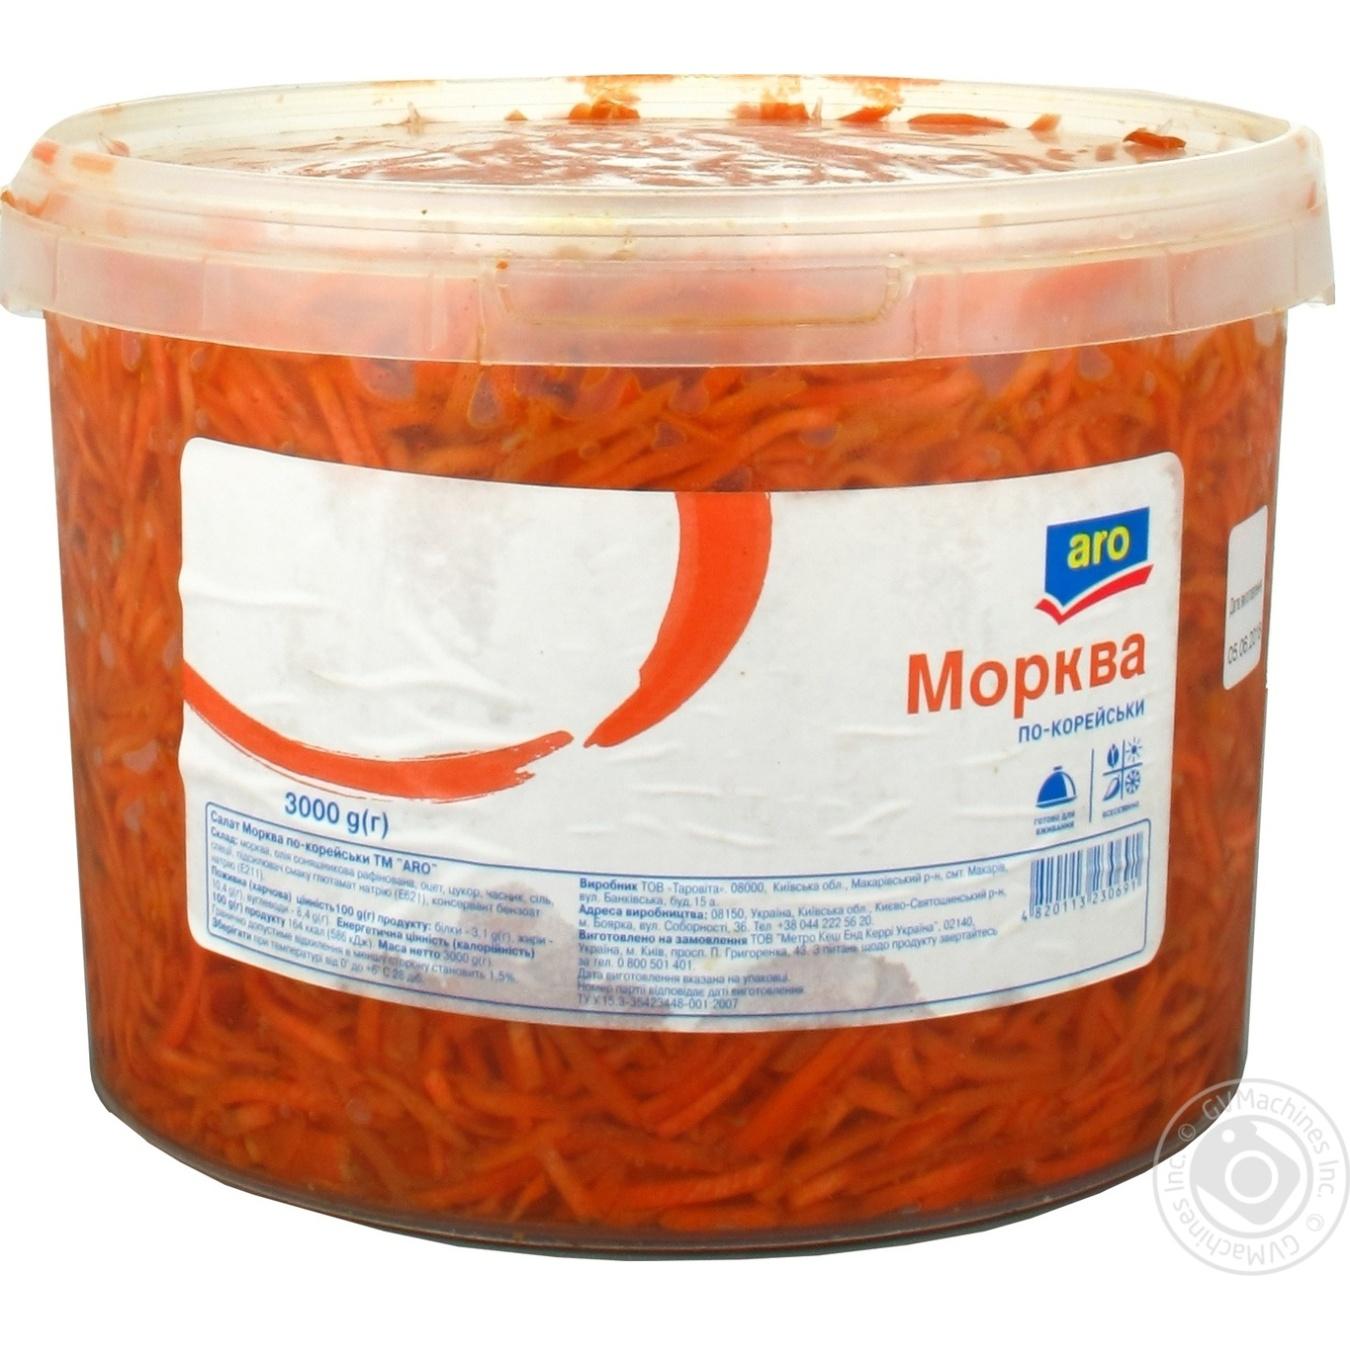 Aro korean salad carrot 3000g → Canned food and seasonings